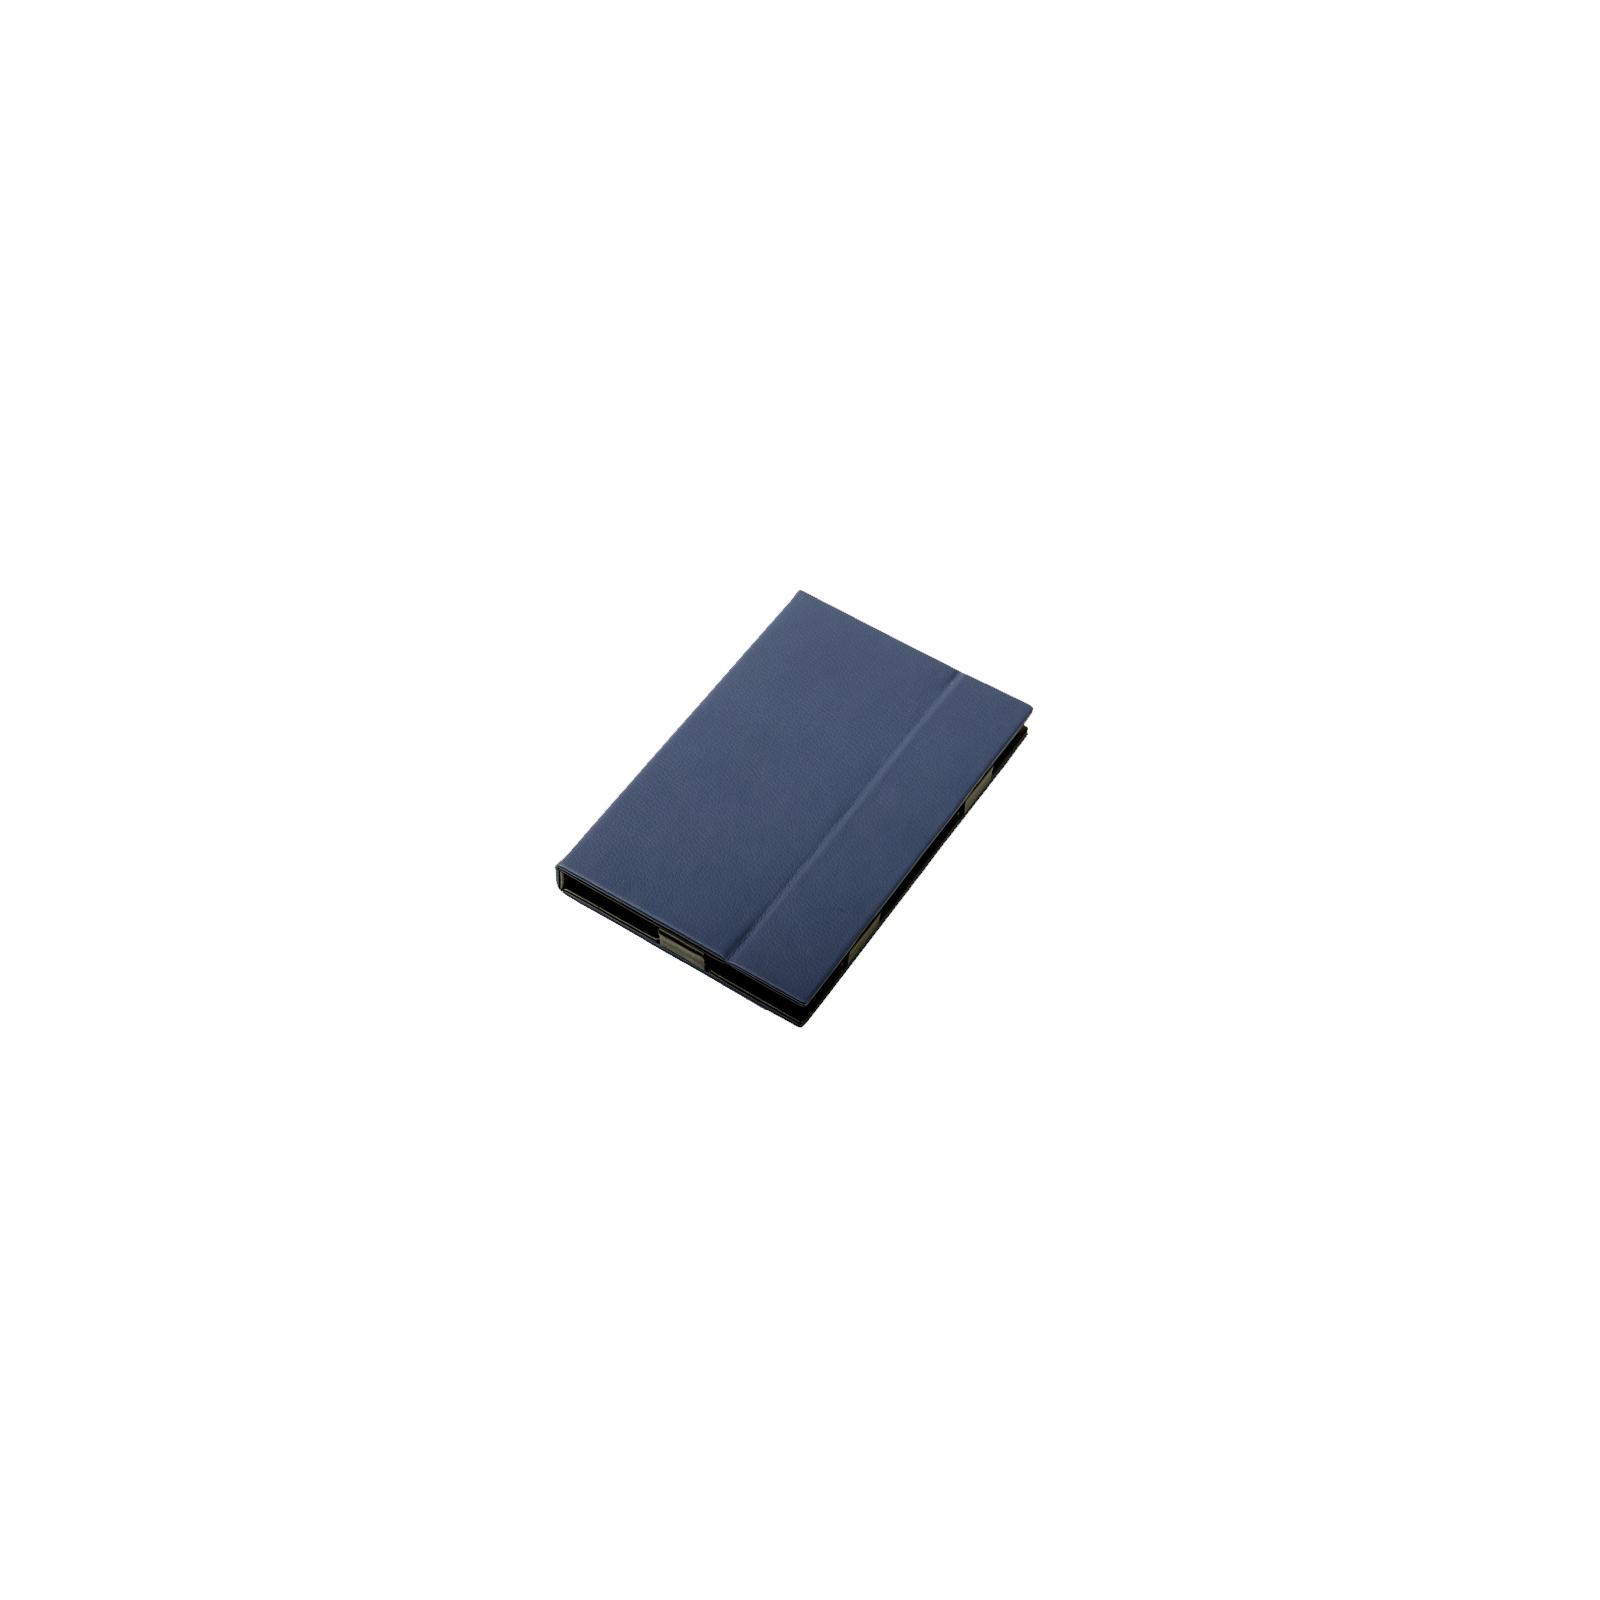 Чехол для планшета Vento 9.7 Desire Matt - dark blue